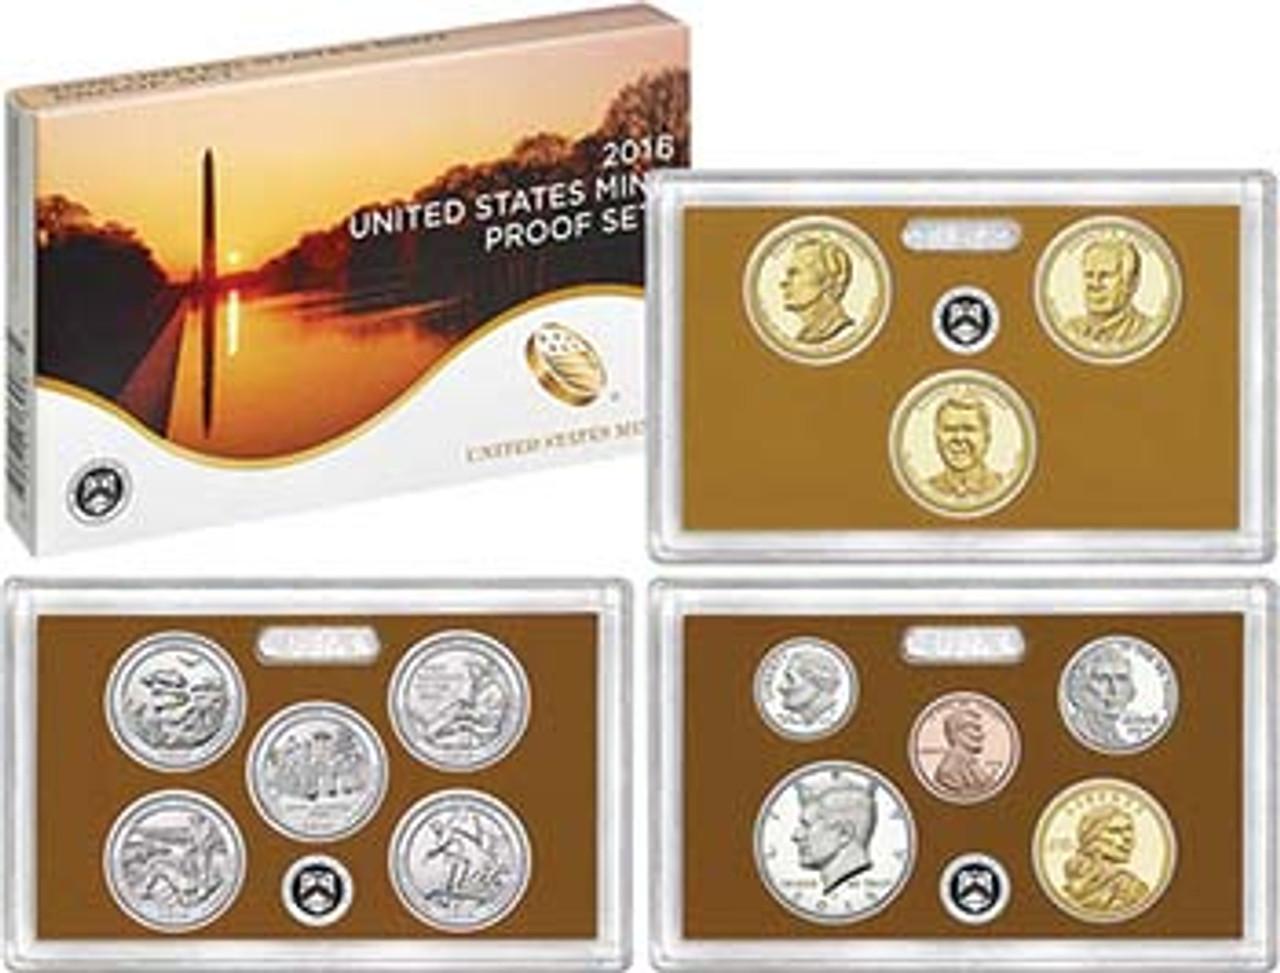 2016 Proof Set 13 Coins Image 1